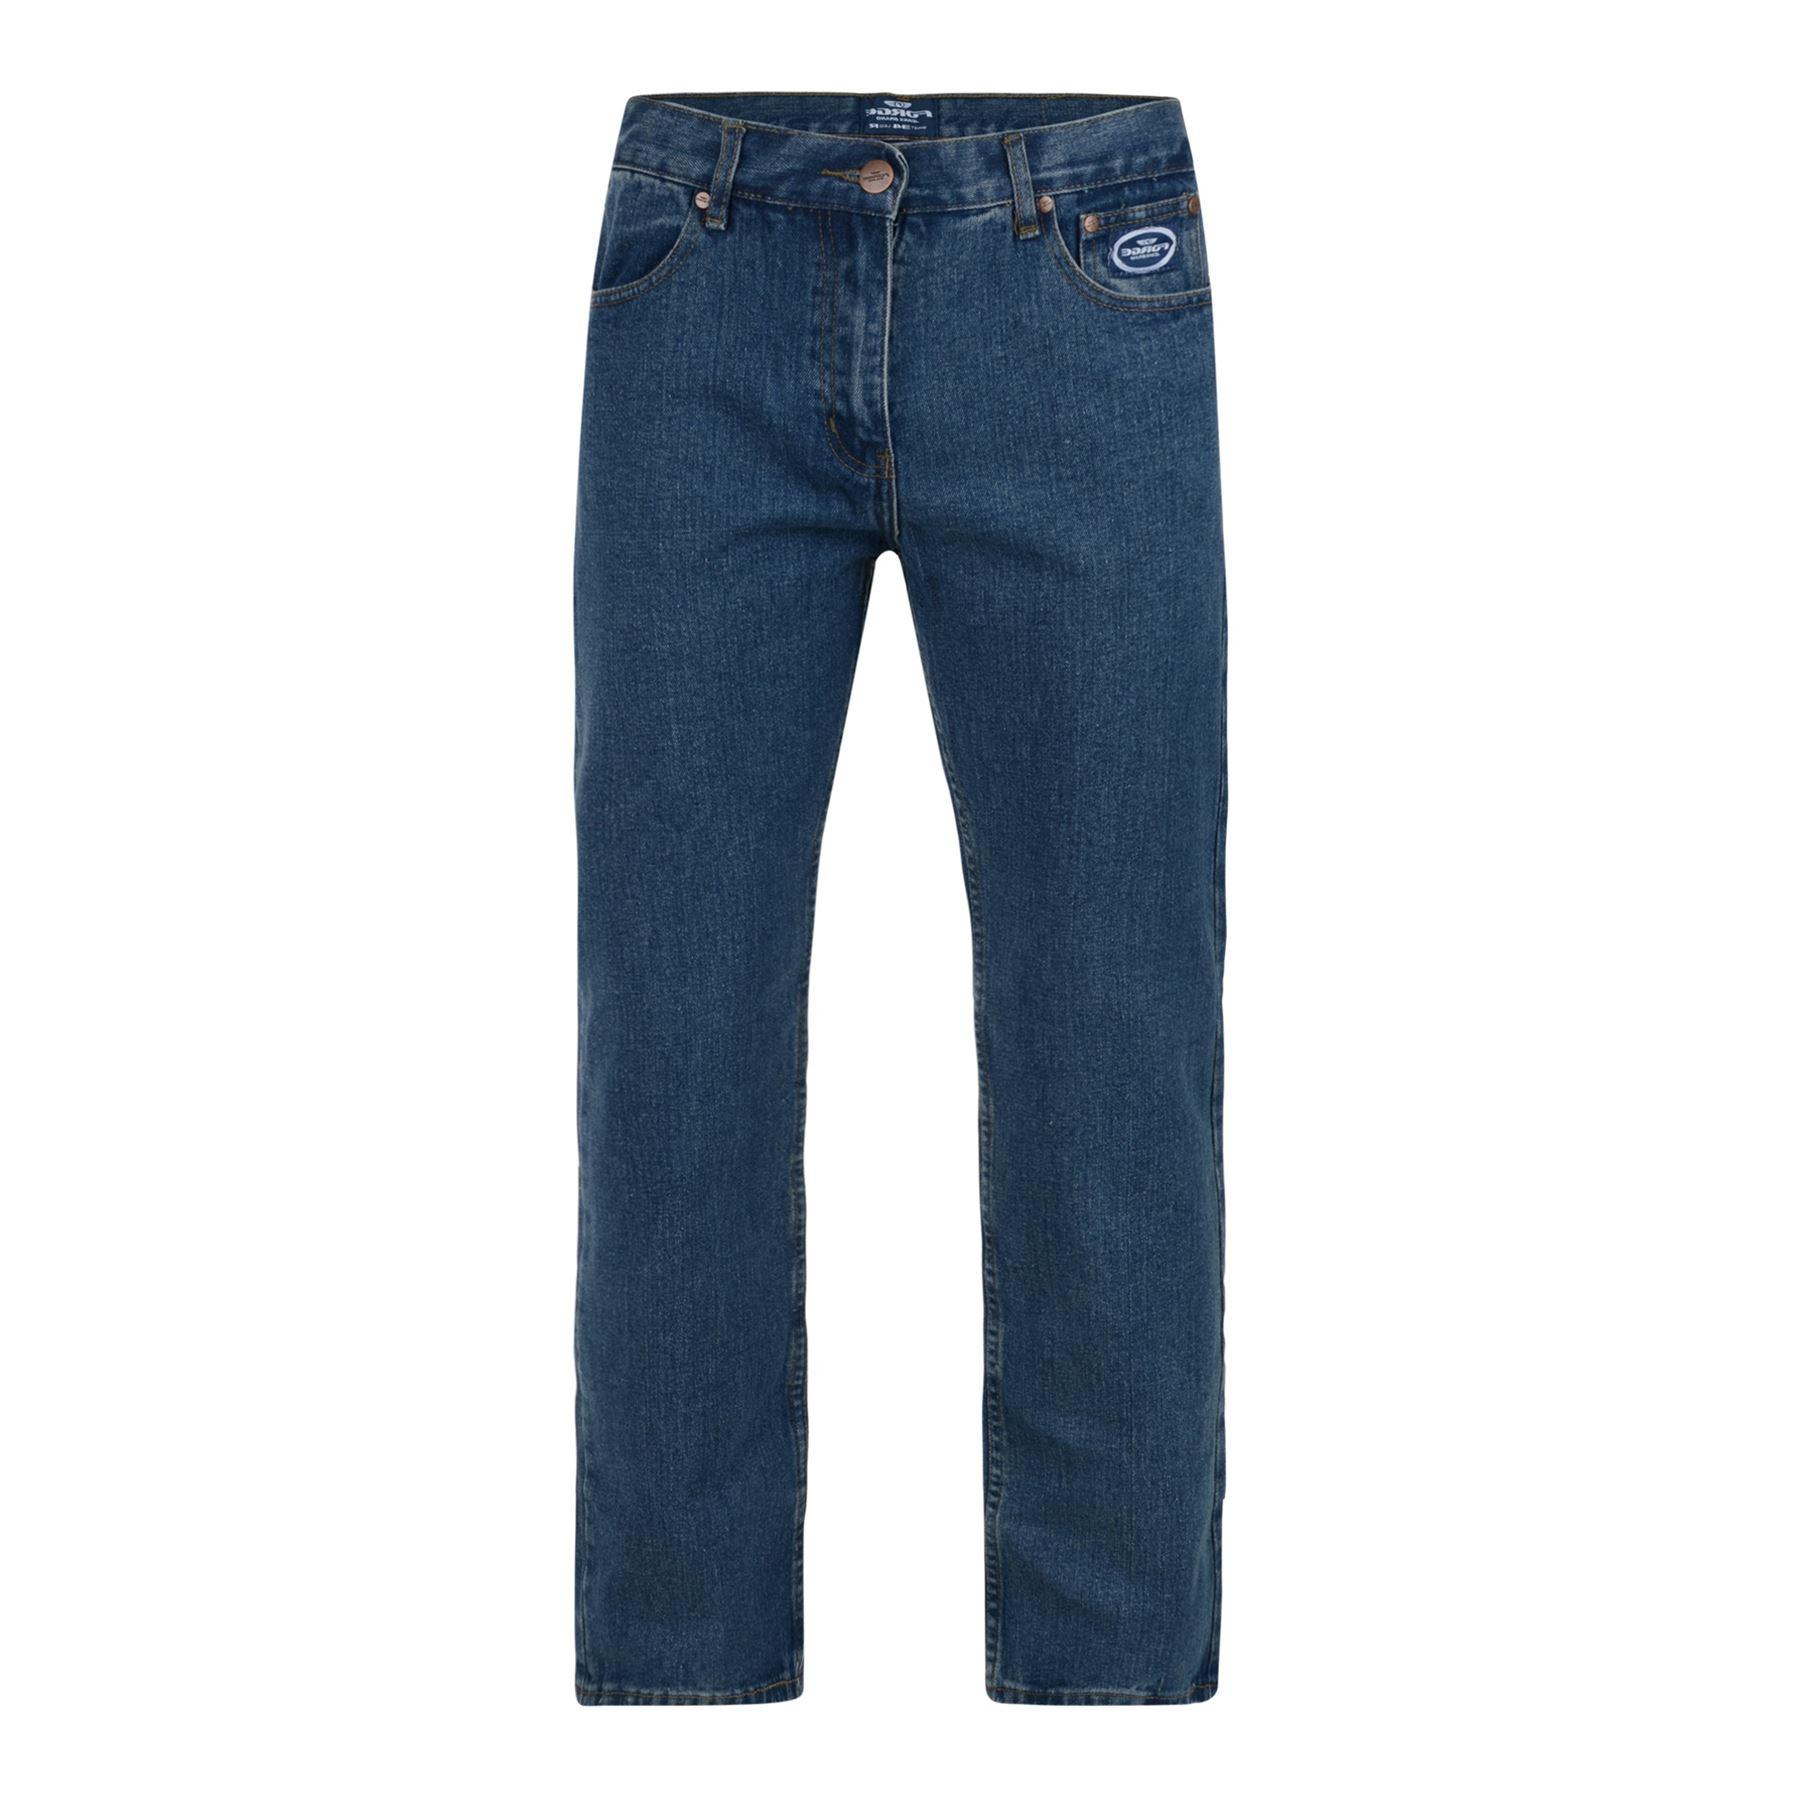 4096ed94128 Details about Mens Jeans Denim Black Blue Big Mens Waist 40 42 44 46 48 50  52 54 56 58 60